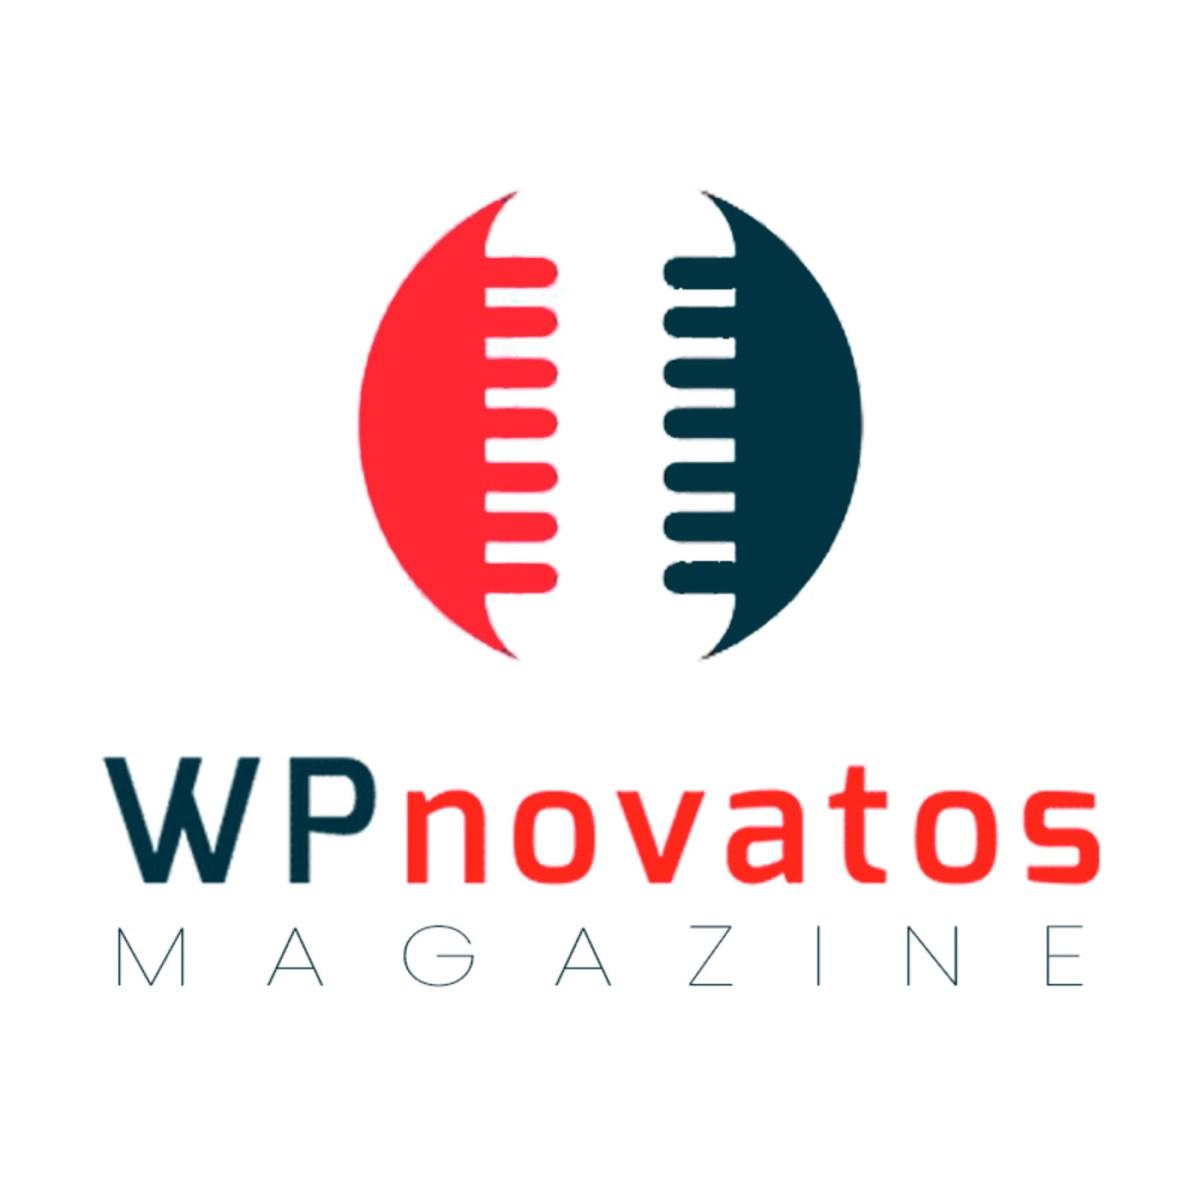 WPnovatos Magazine: WordPress para Novatos